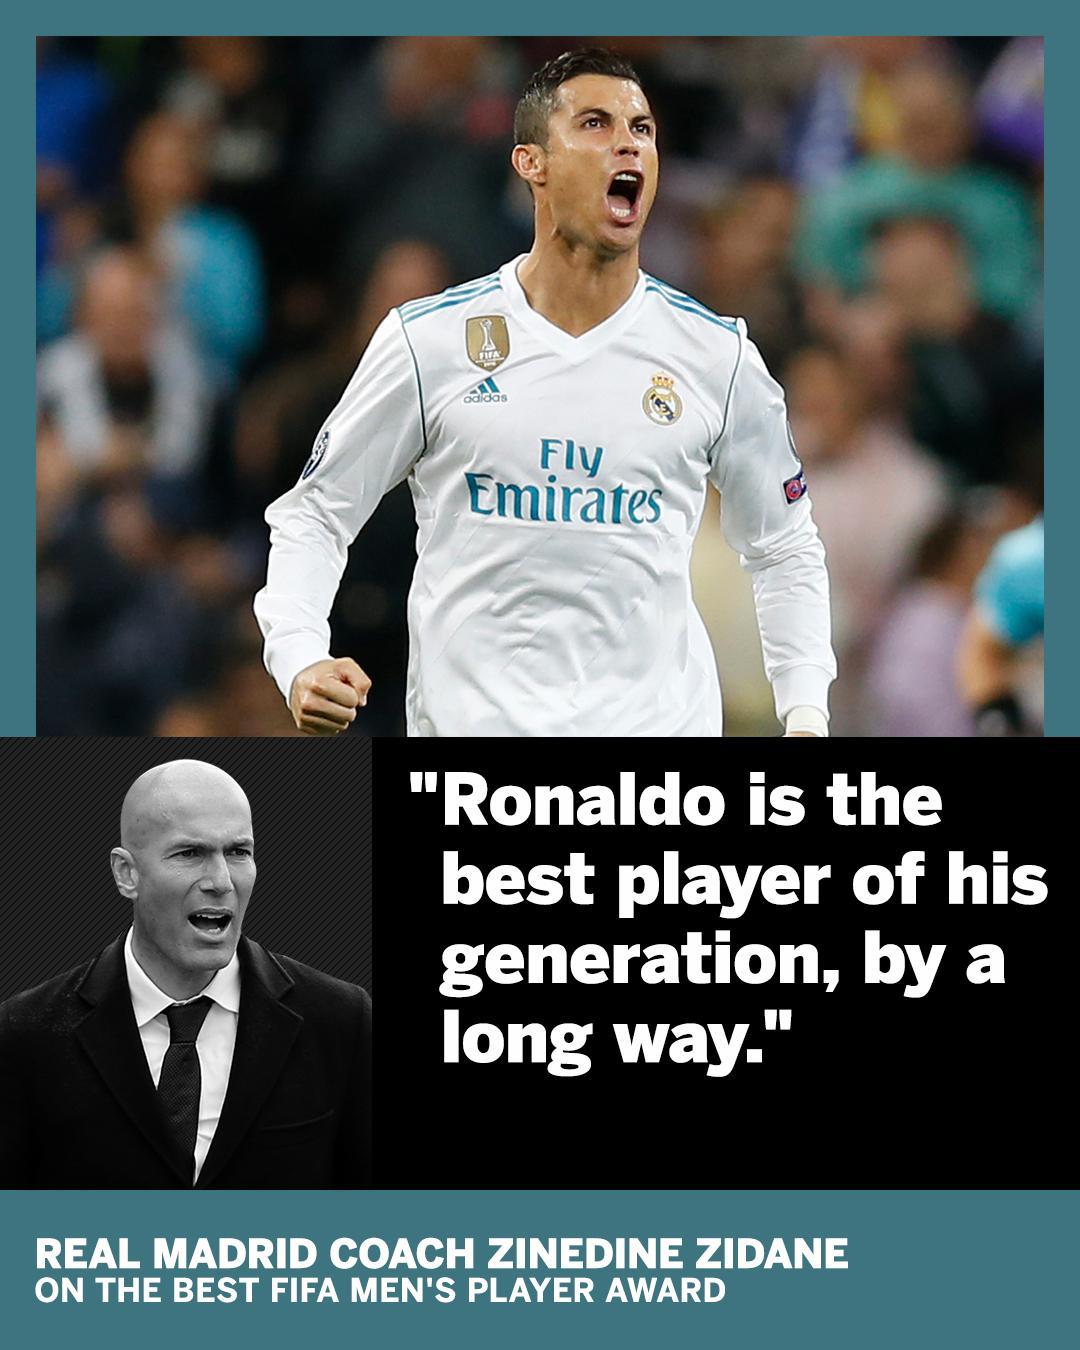 ⚪️ Messi  ⚪️ Neymar �� Ronaldo  Zidane knows his pick. https://t.co/6t2hb89gLW